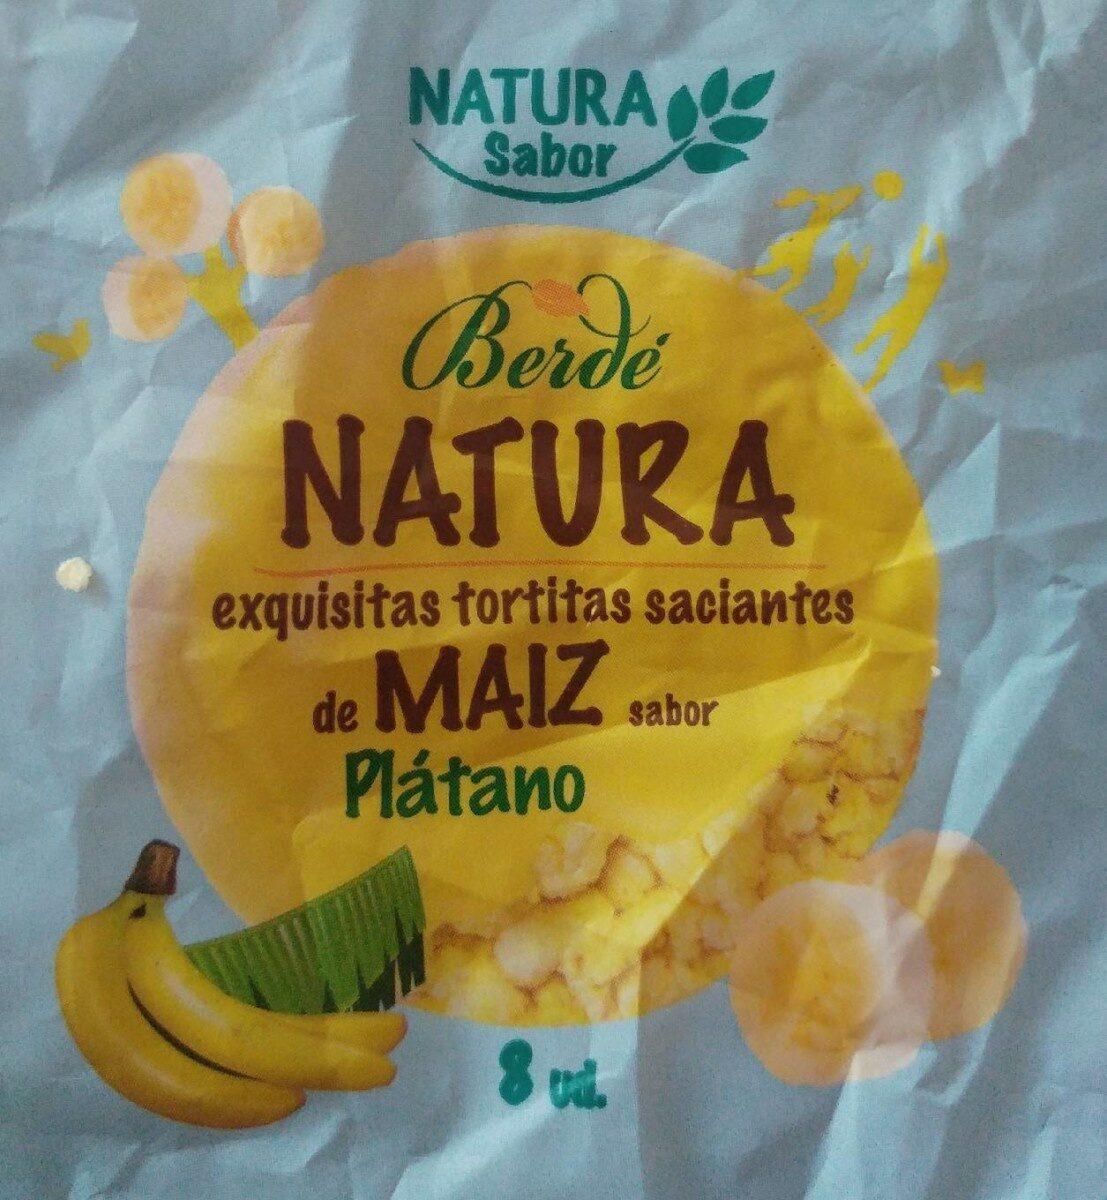 Tortitas saciantes de maiz sabor plátano - Producto - es